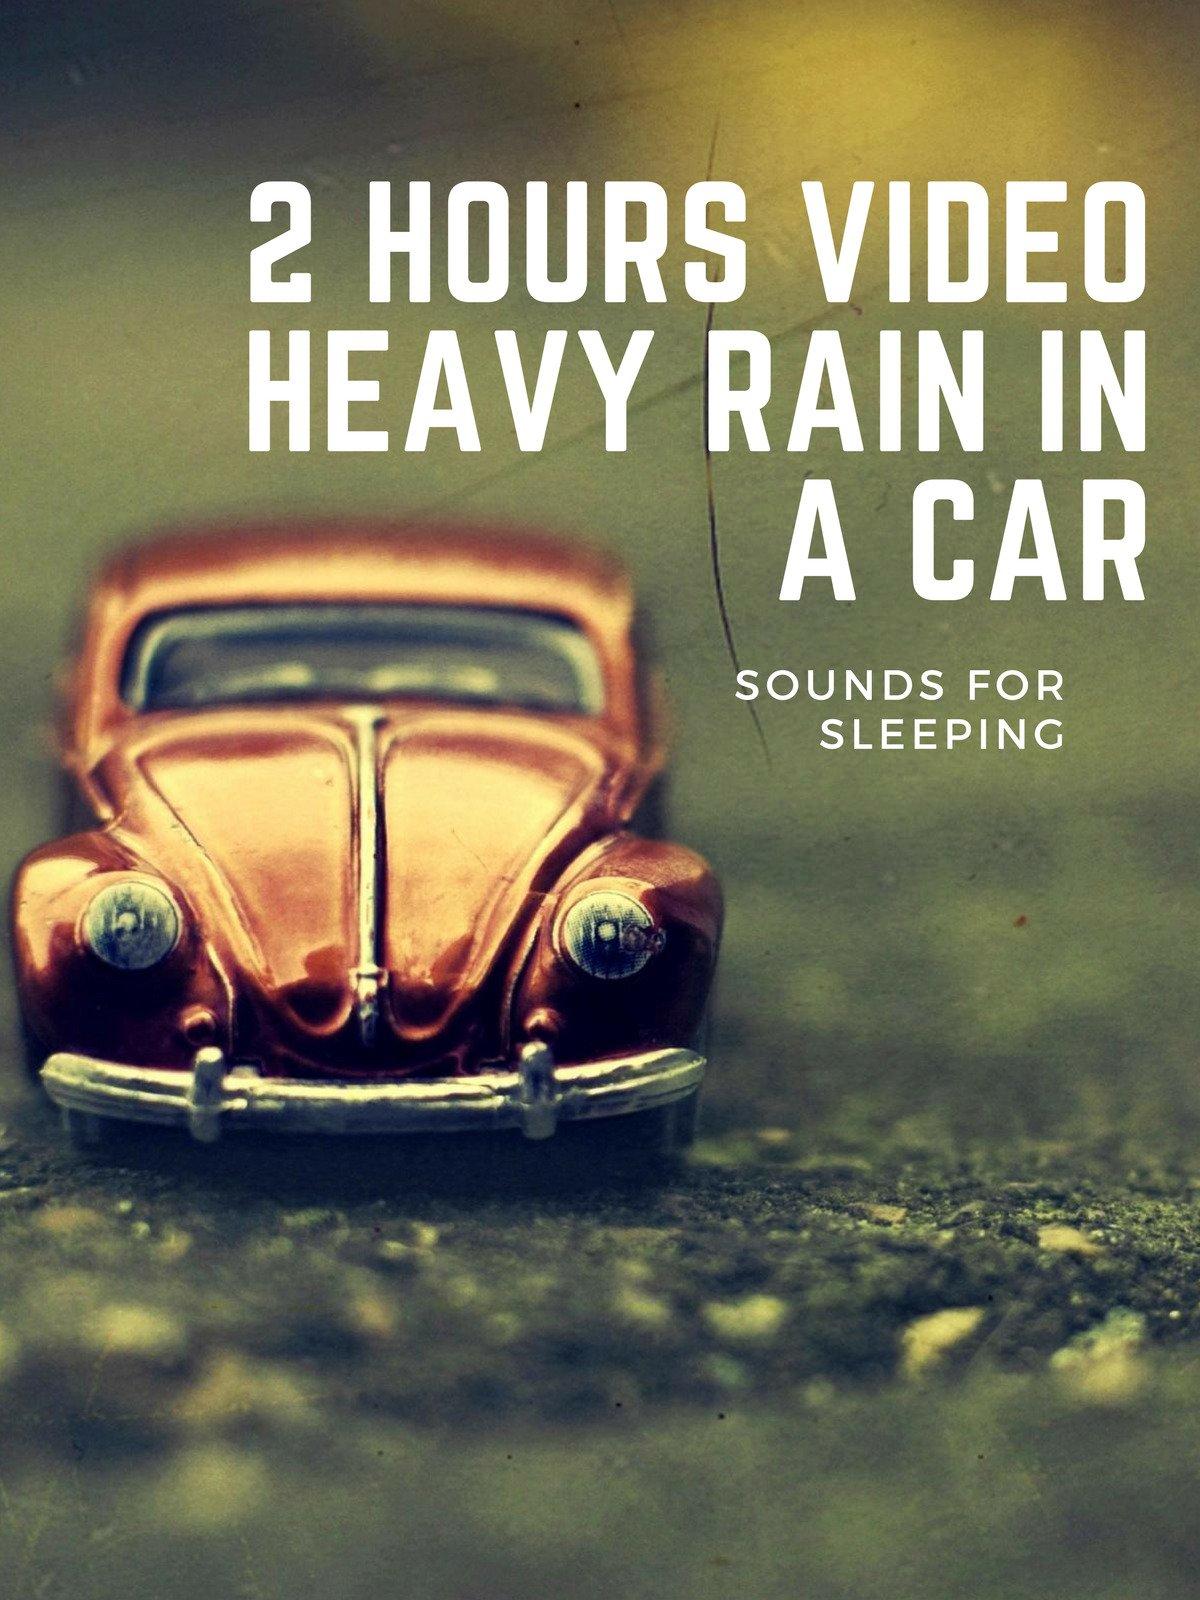 2 Hours Video Heavy Rain in a Car